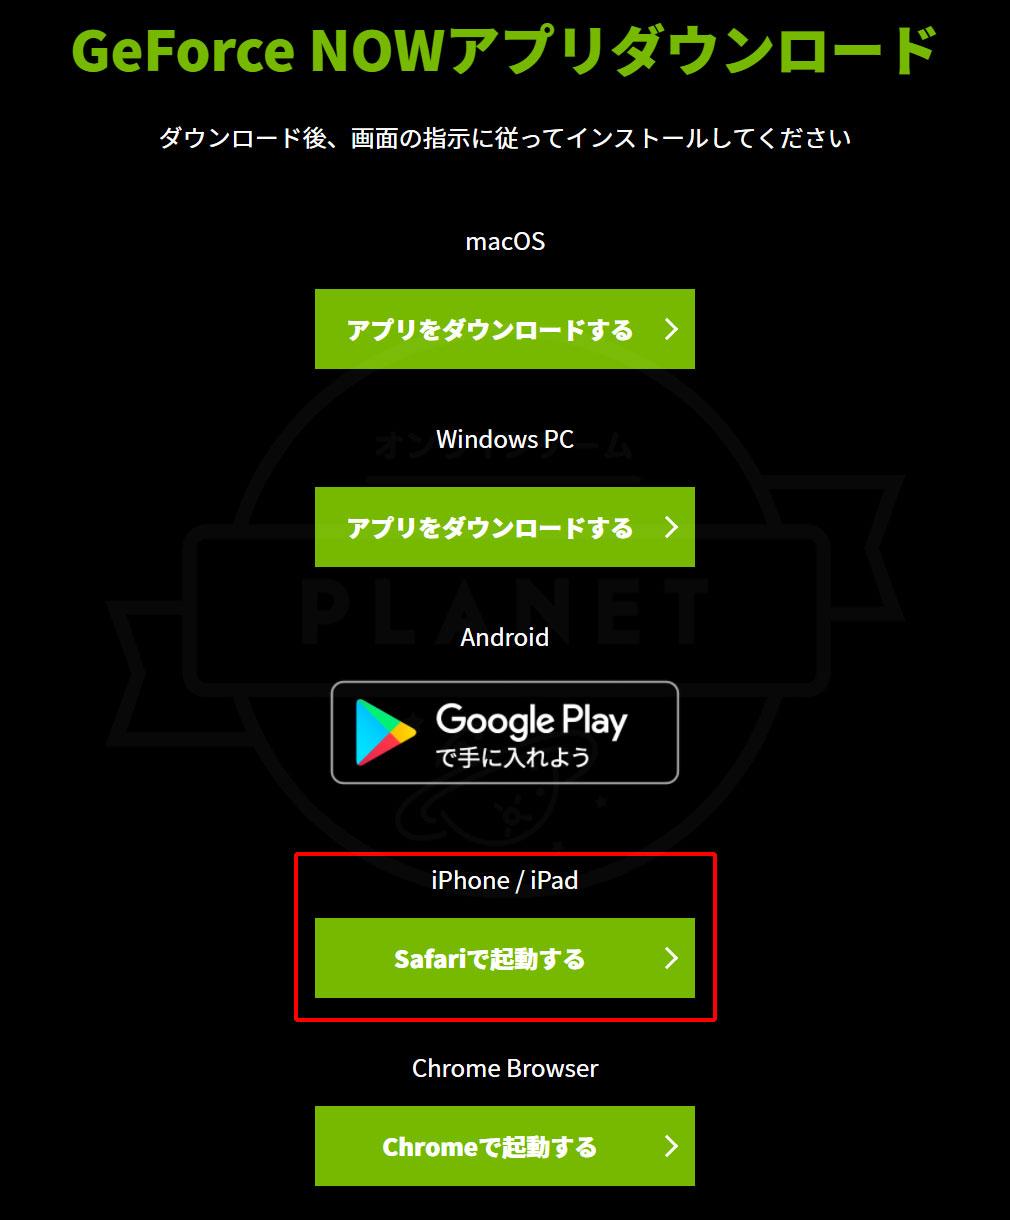 GeForce NOW Powered by SoftBank iPhone/iPad版『ダウンロードした画面』スクリーンショット